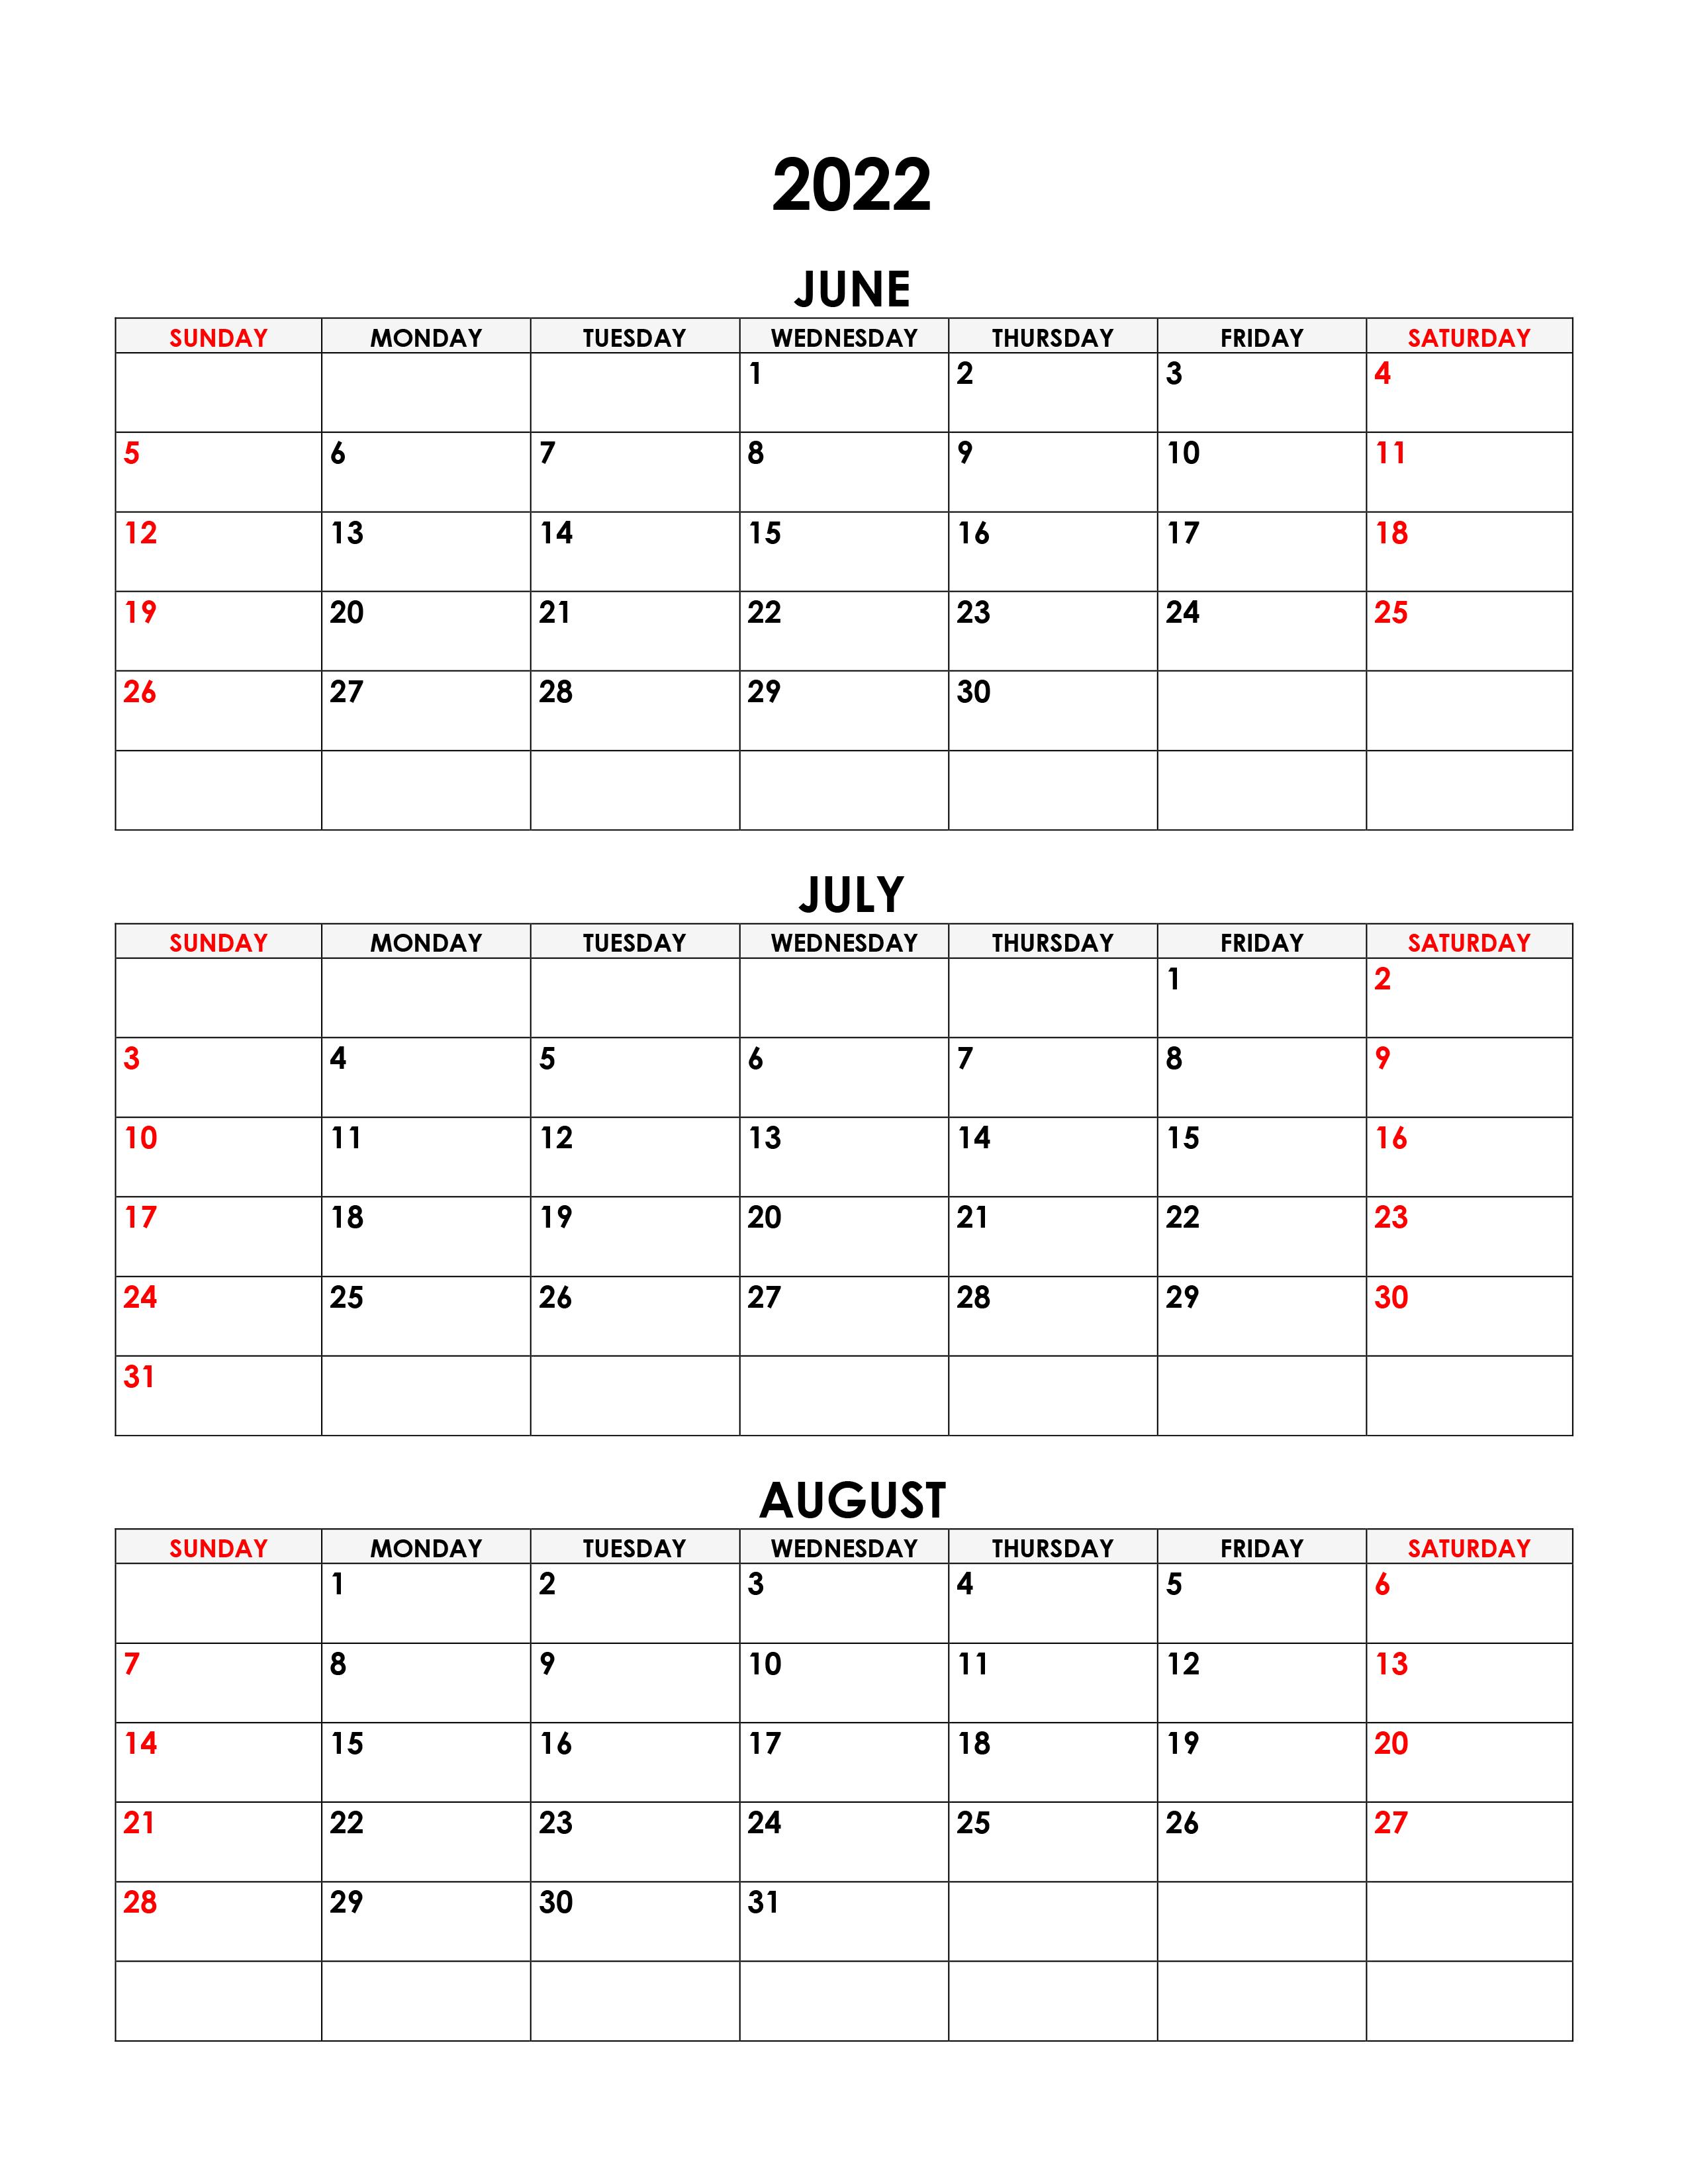 Calendar July August 2022.Calendar For June July August 2022 Free Calendar Su